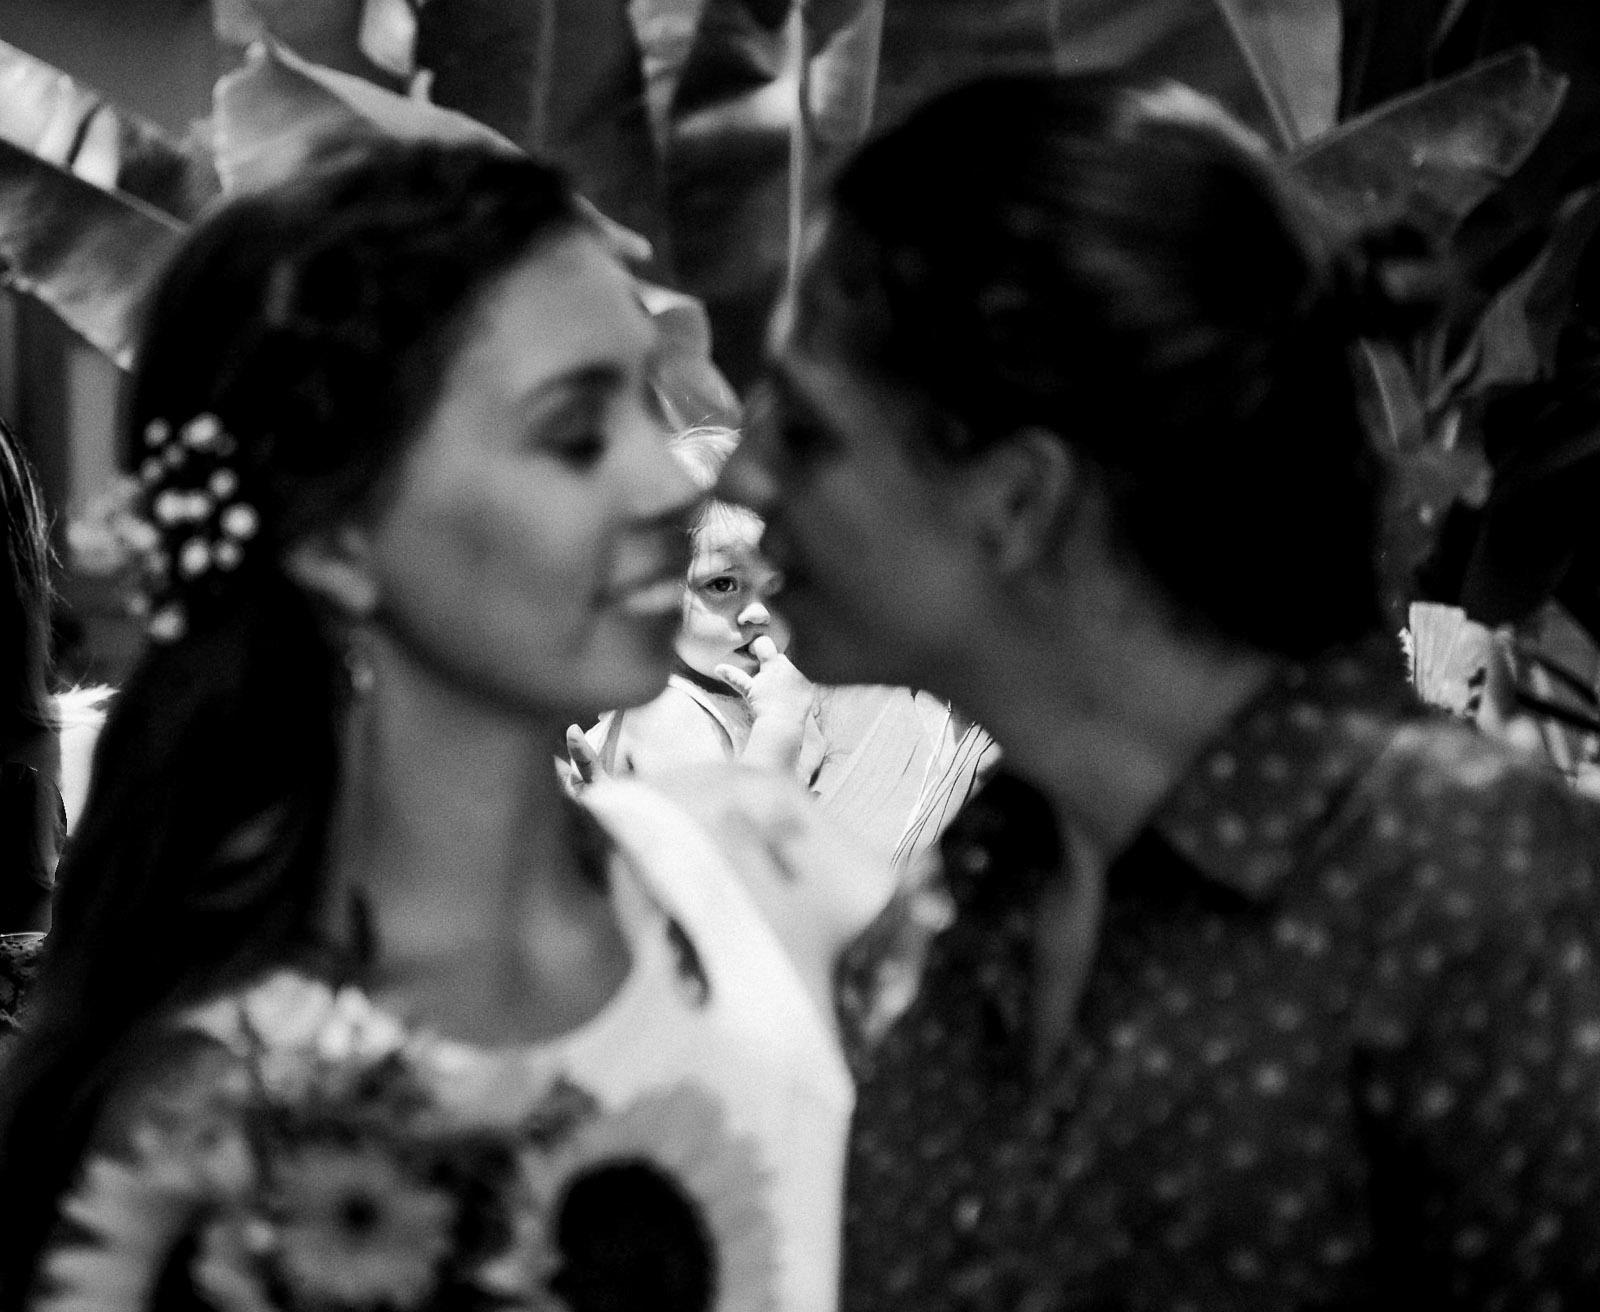 wedding (10 of 29).jpg